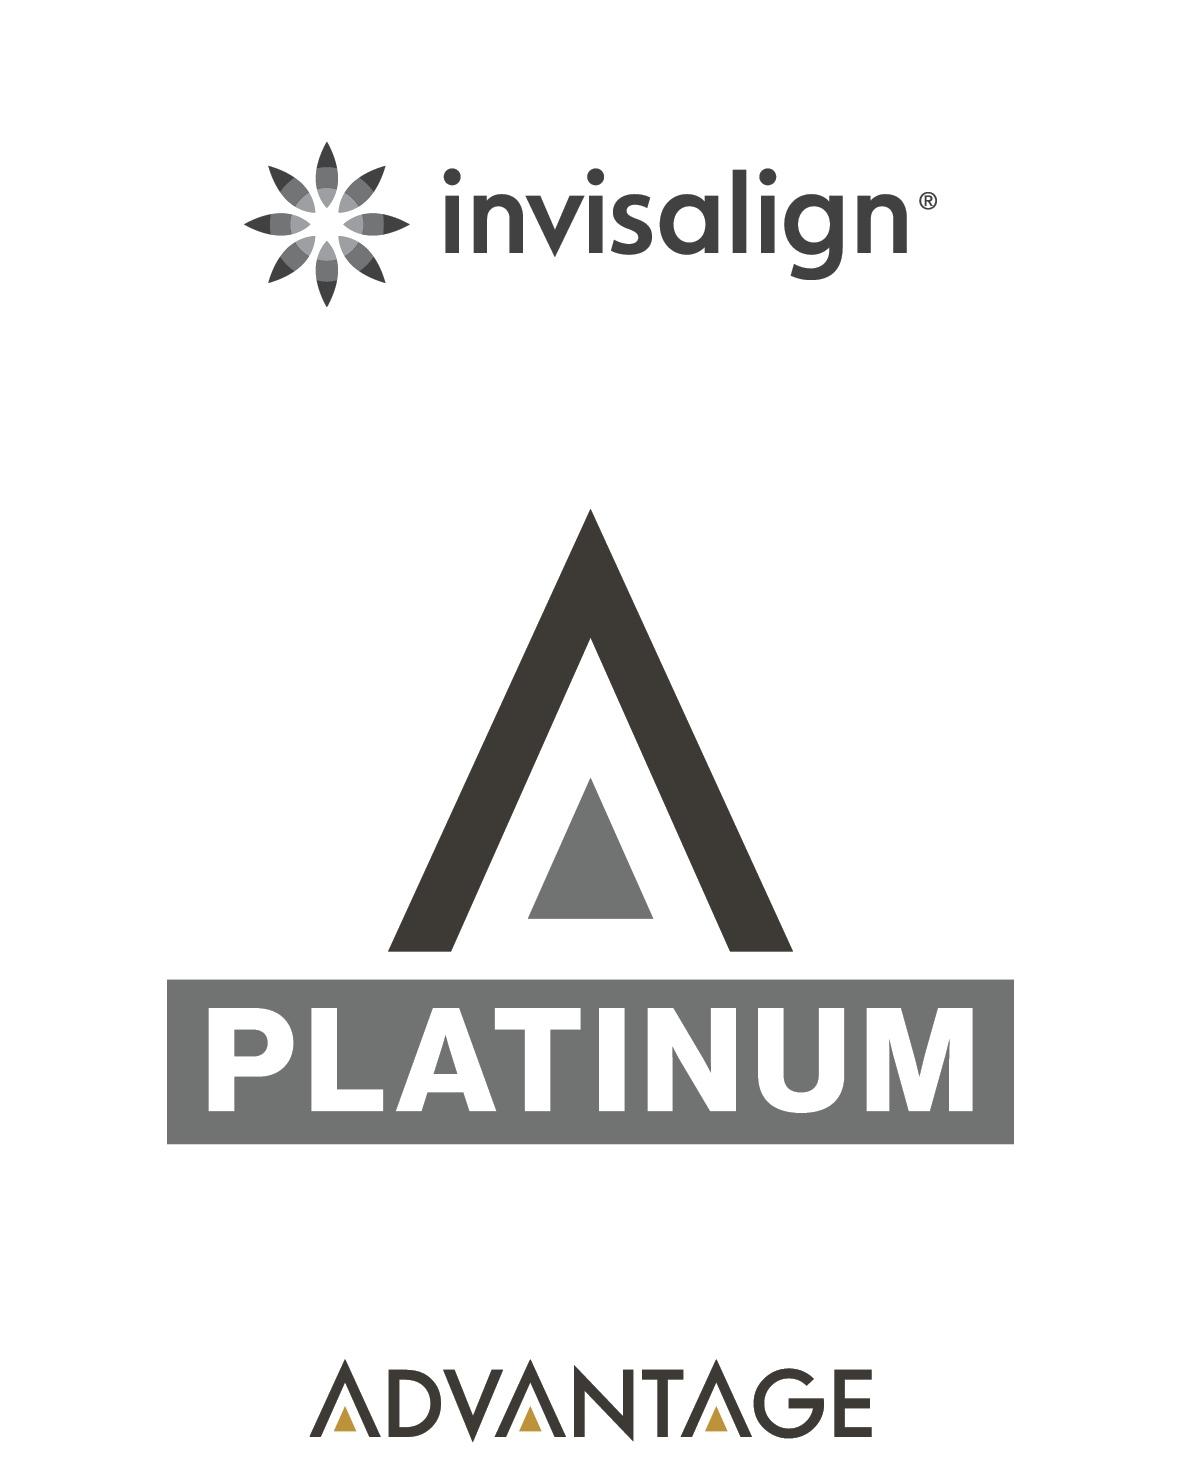 We are Invisalign Platinum Provider